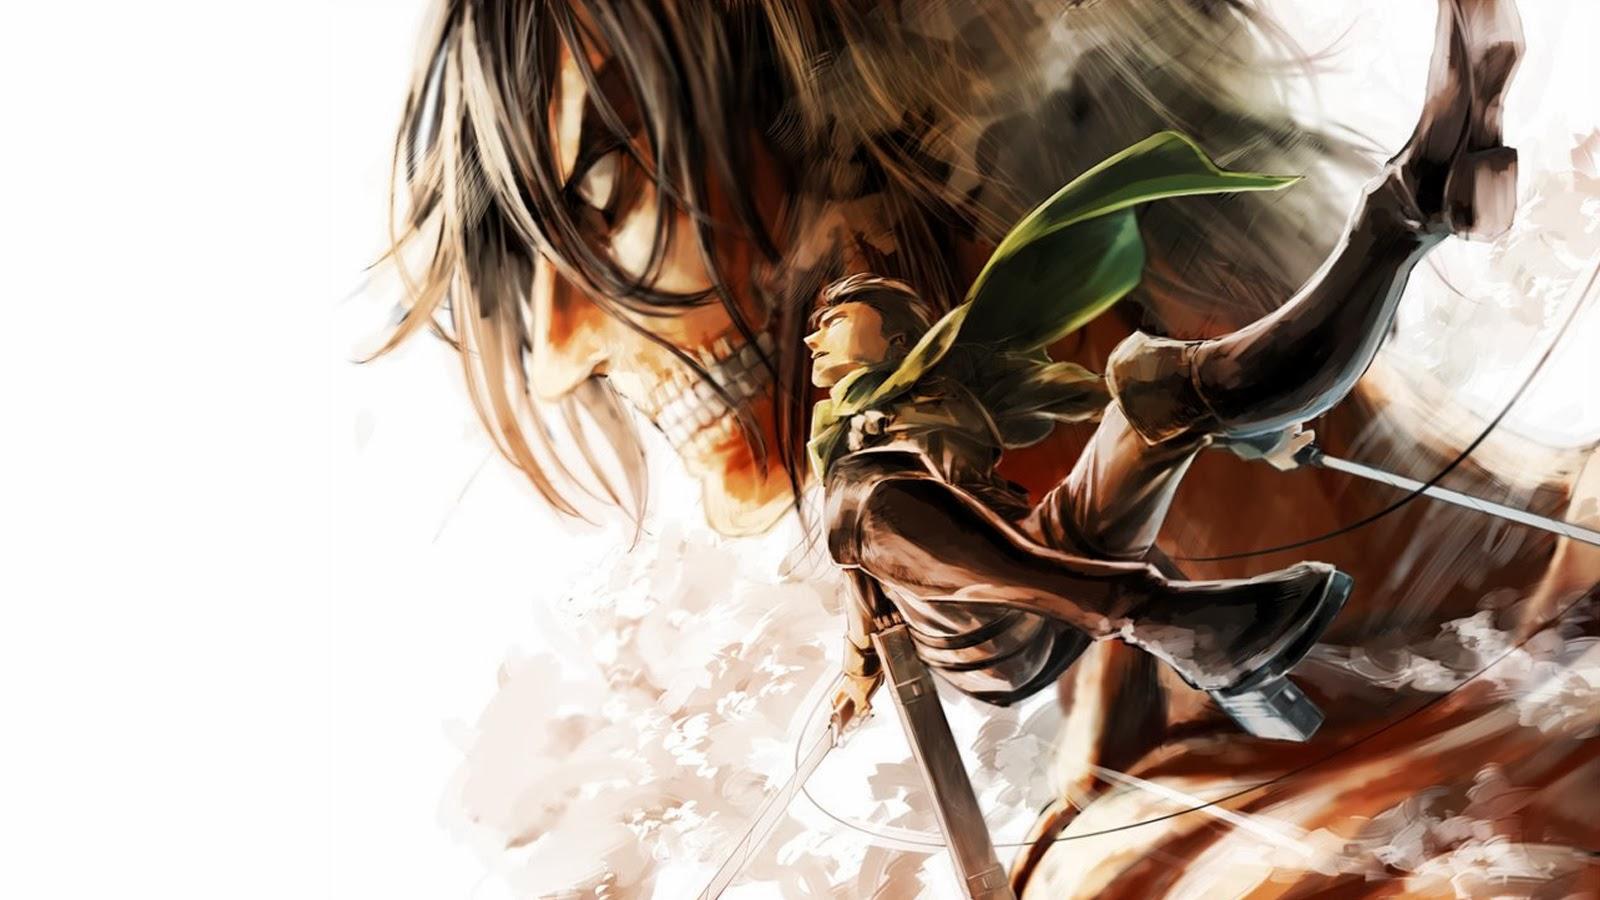 Levi Rogue Titan Eren Jaeger Yeager Attack On Shingeki No Kyojin Anime Hd Wallpaper